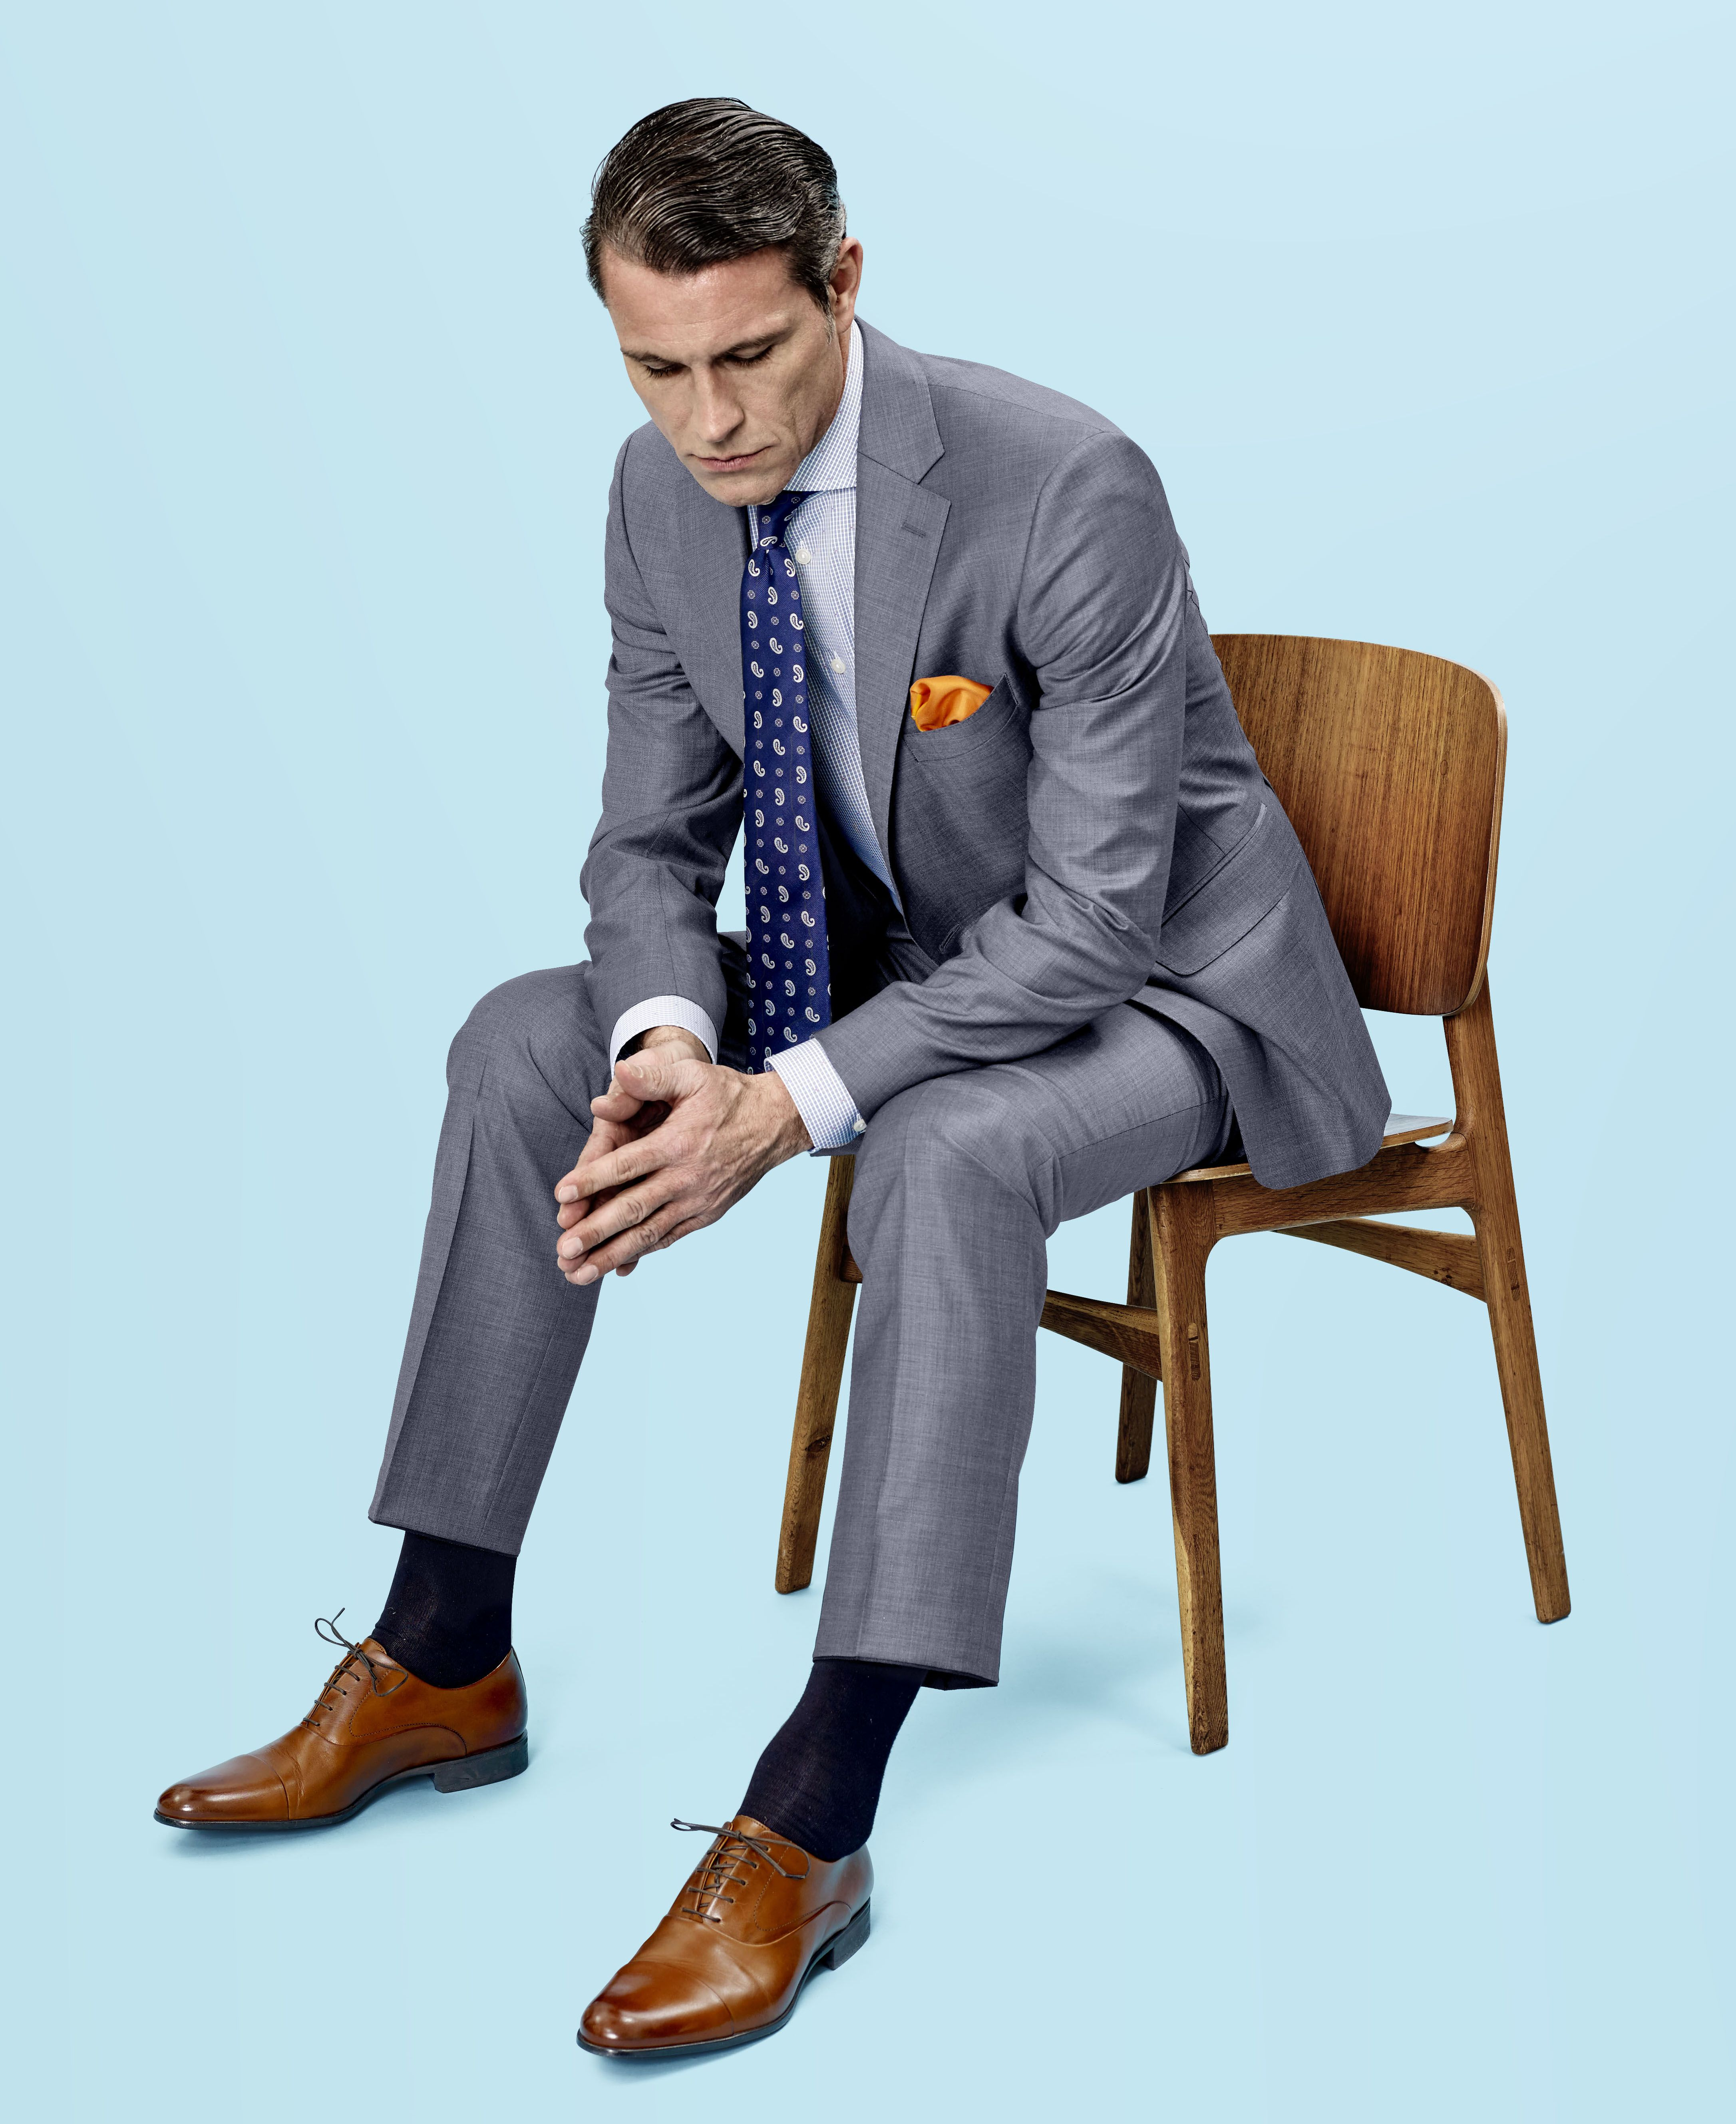 TROELSTRUP SS15. Suit from Eduard Dressler. Shirt from Eton